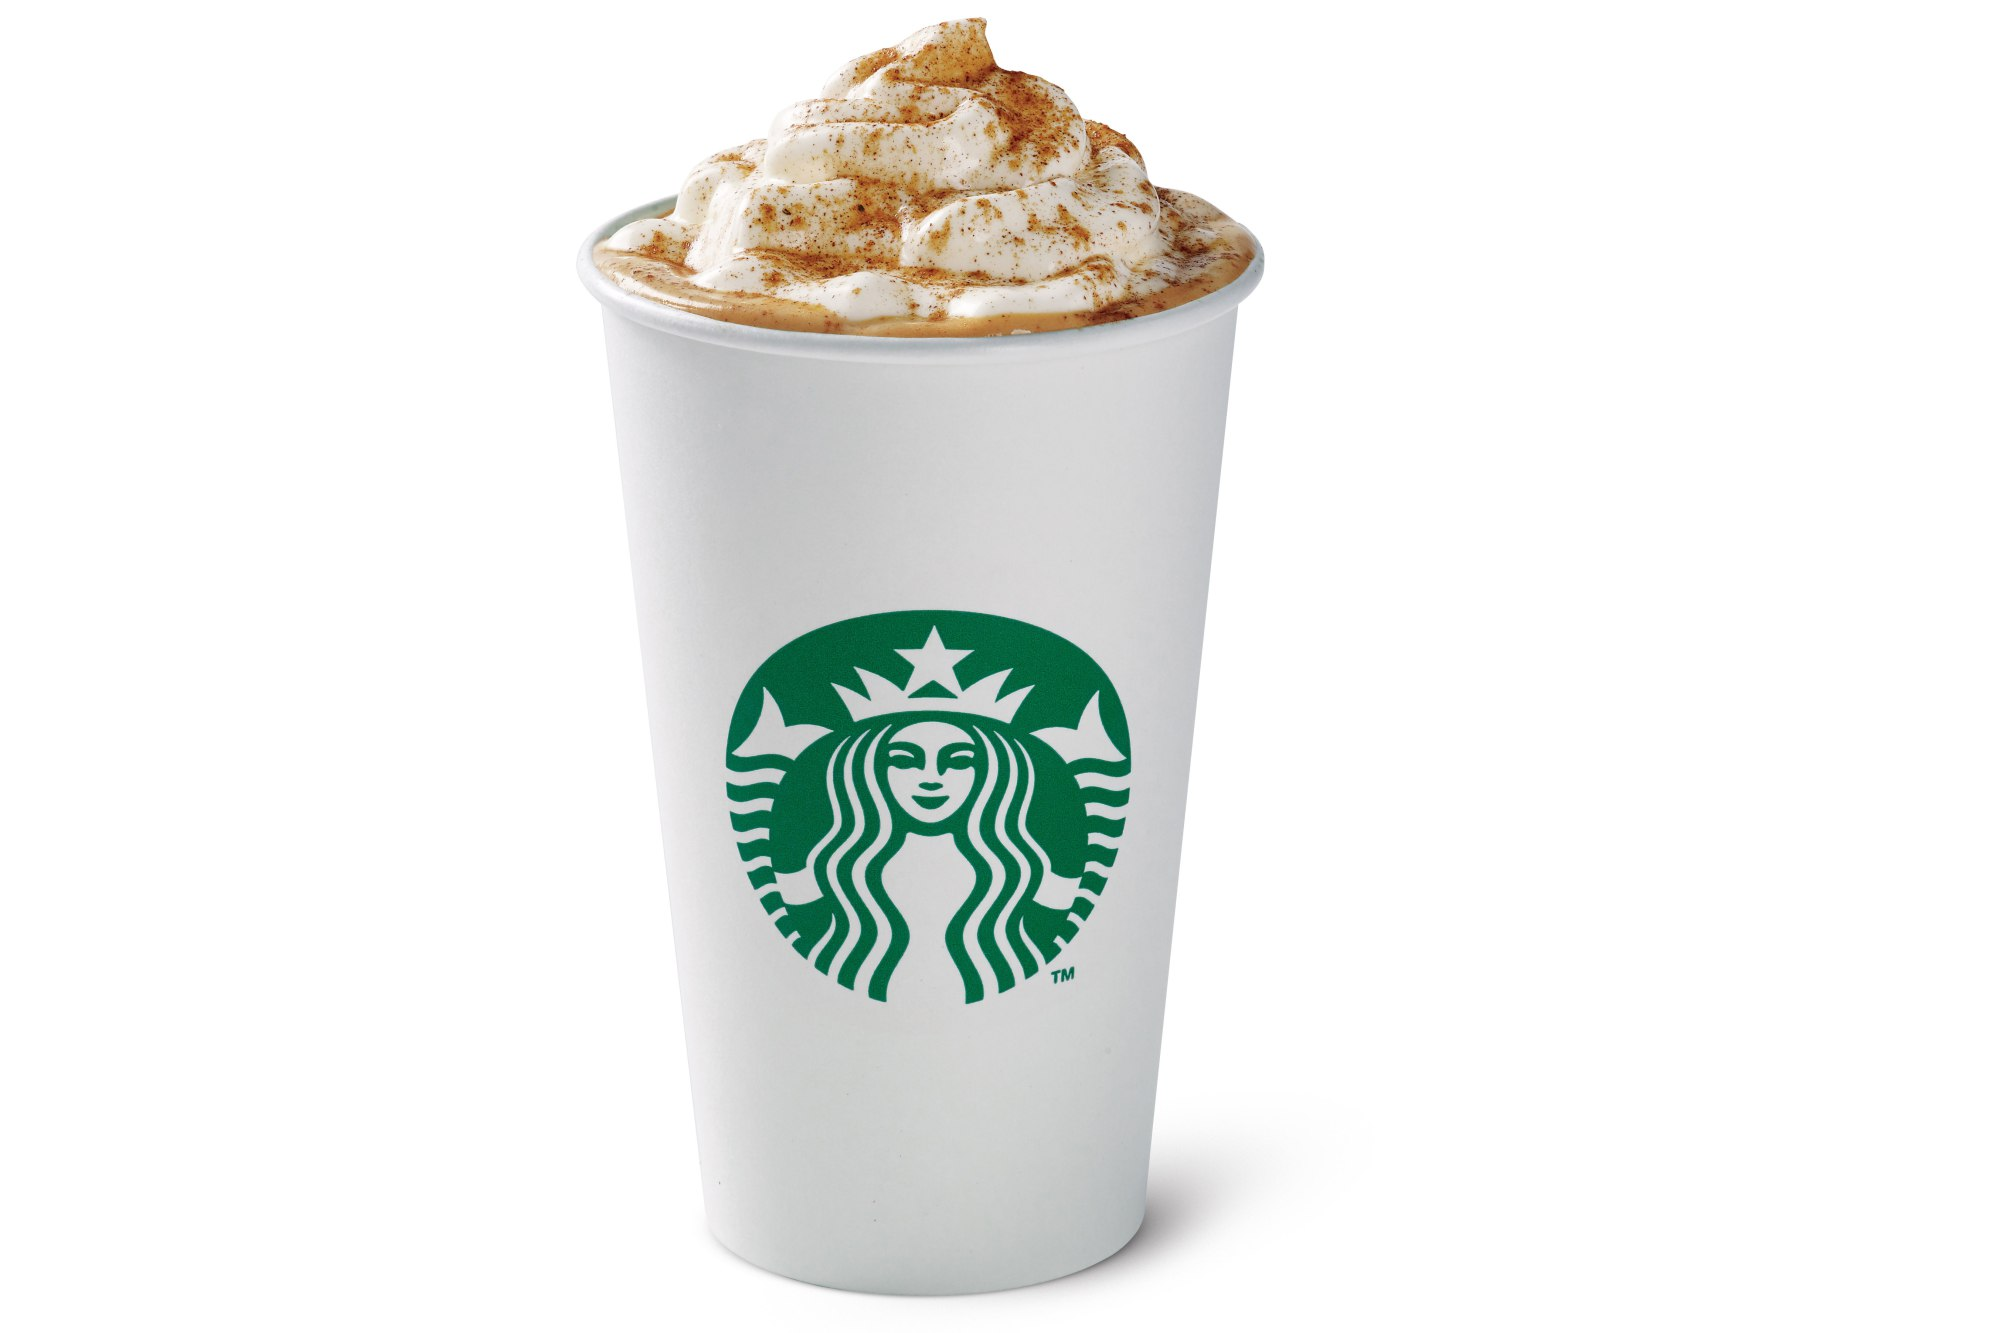 Images of Starbucks | 2000x1333